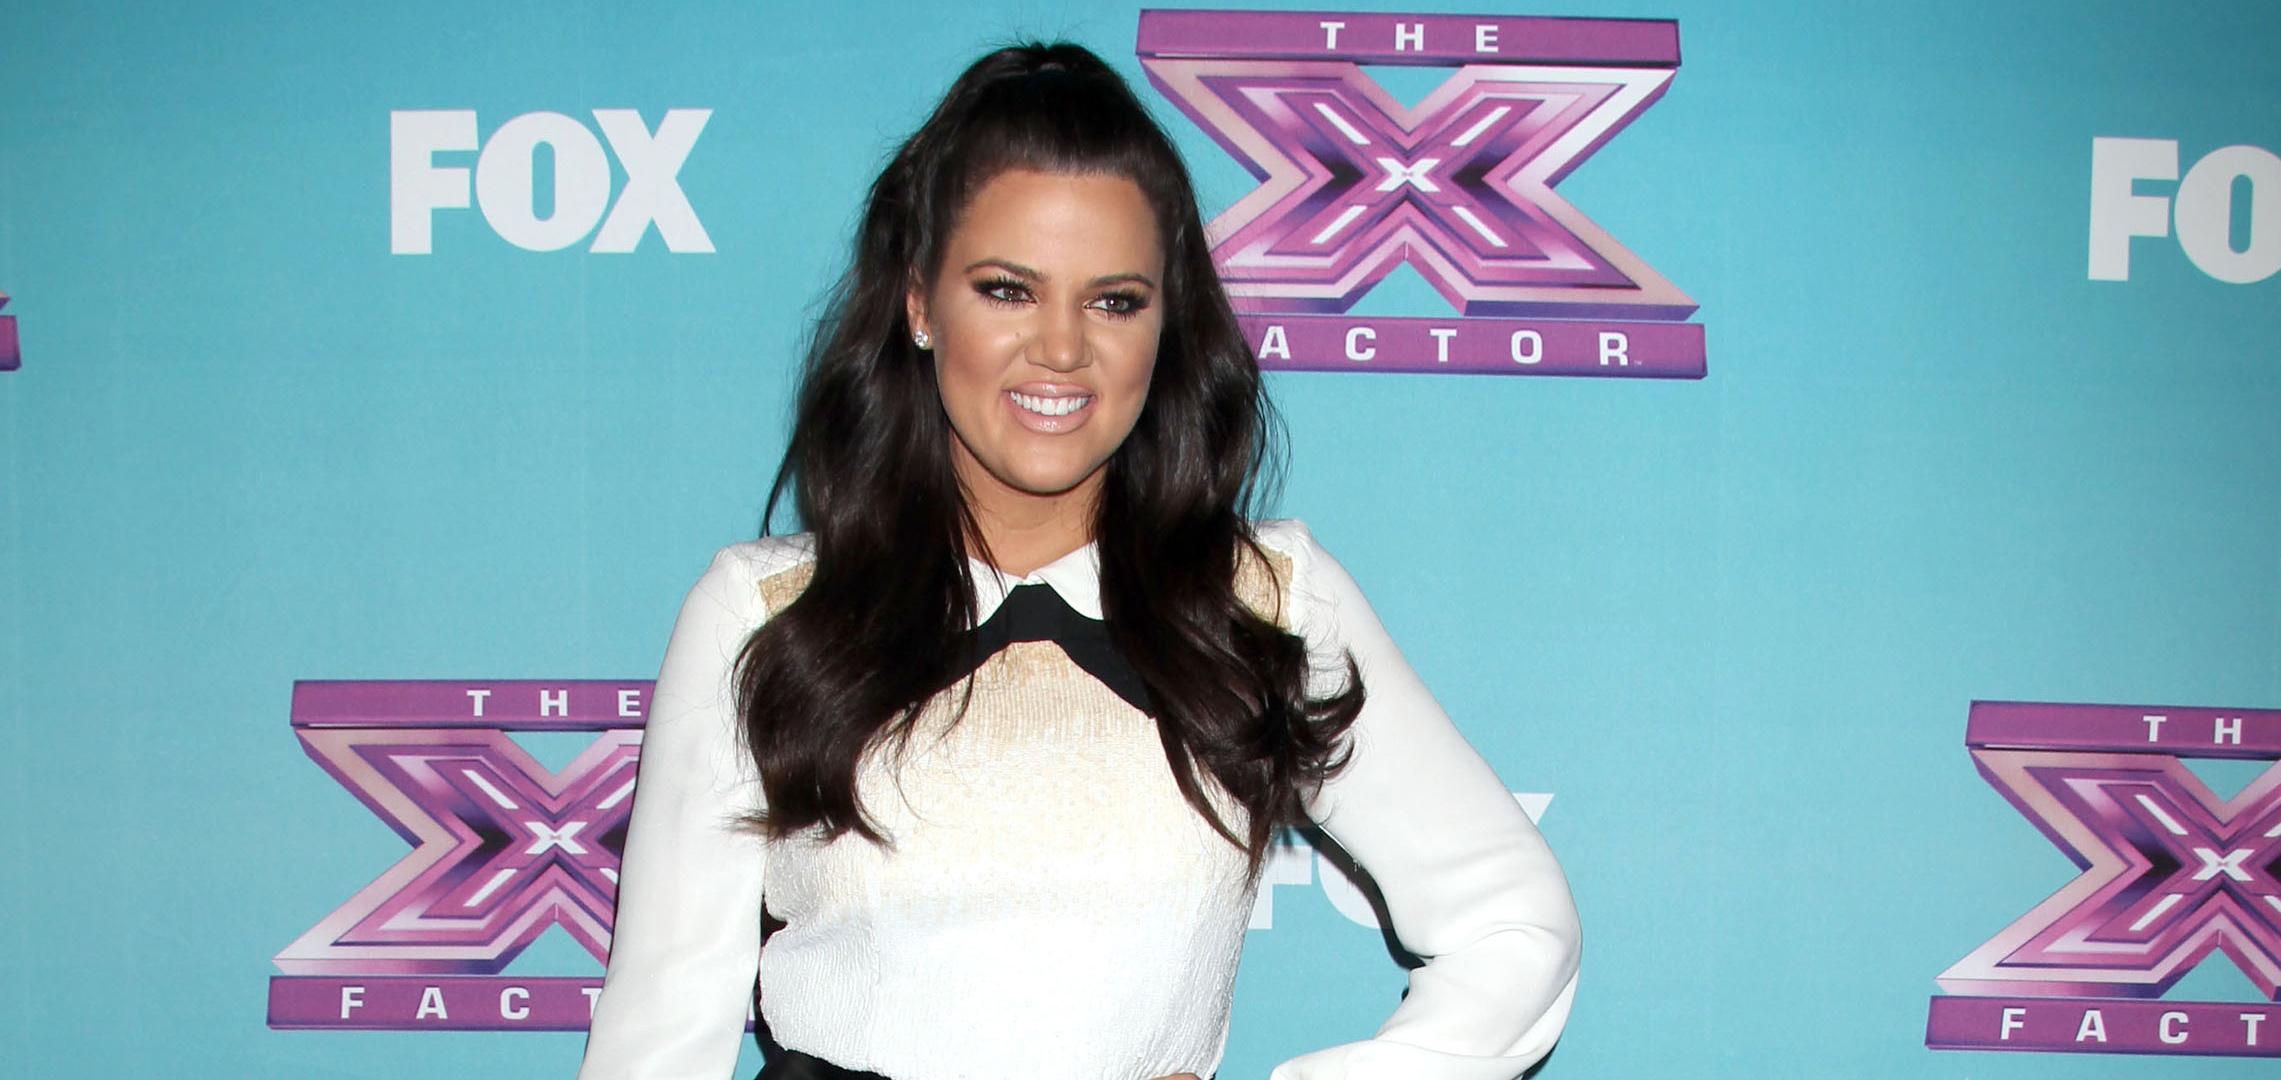 khloe-kardashian-x-factor